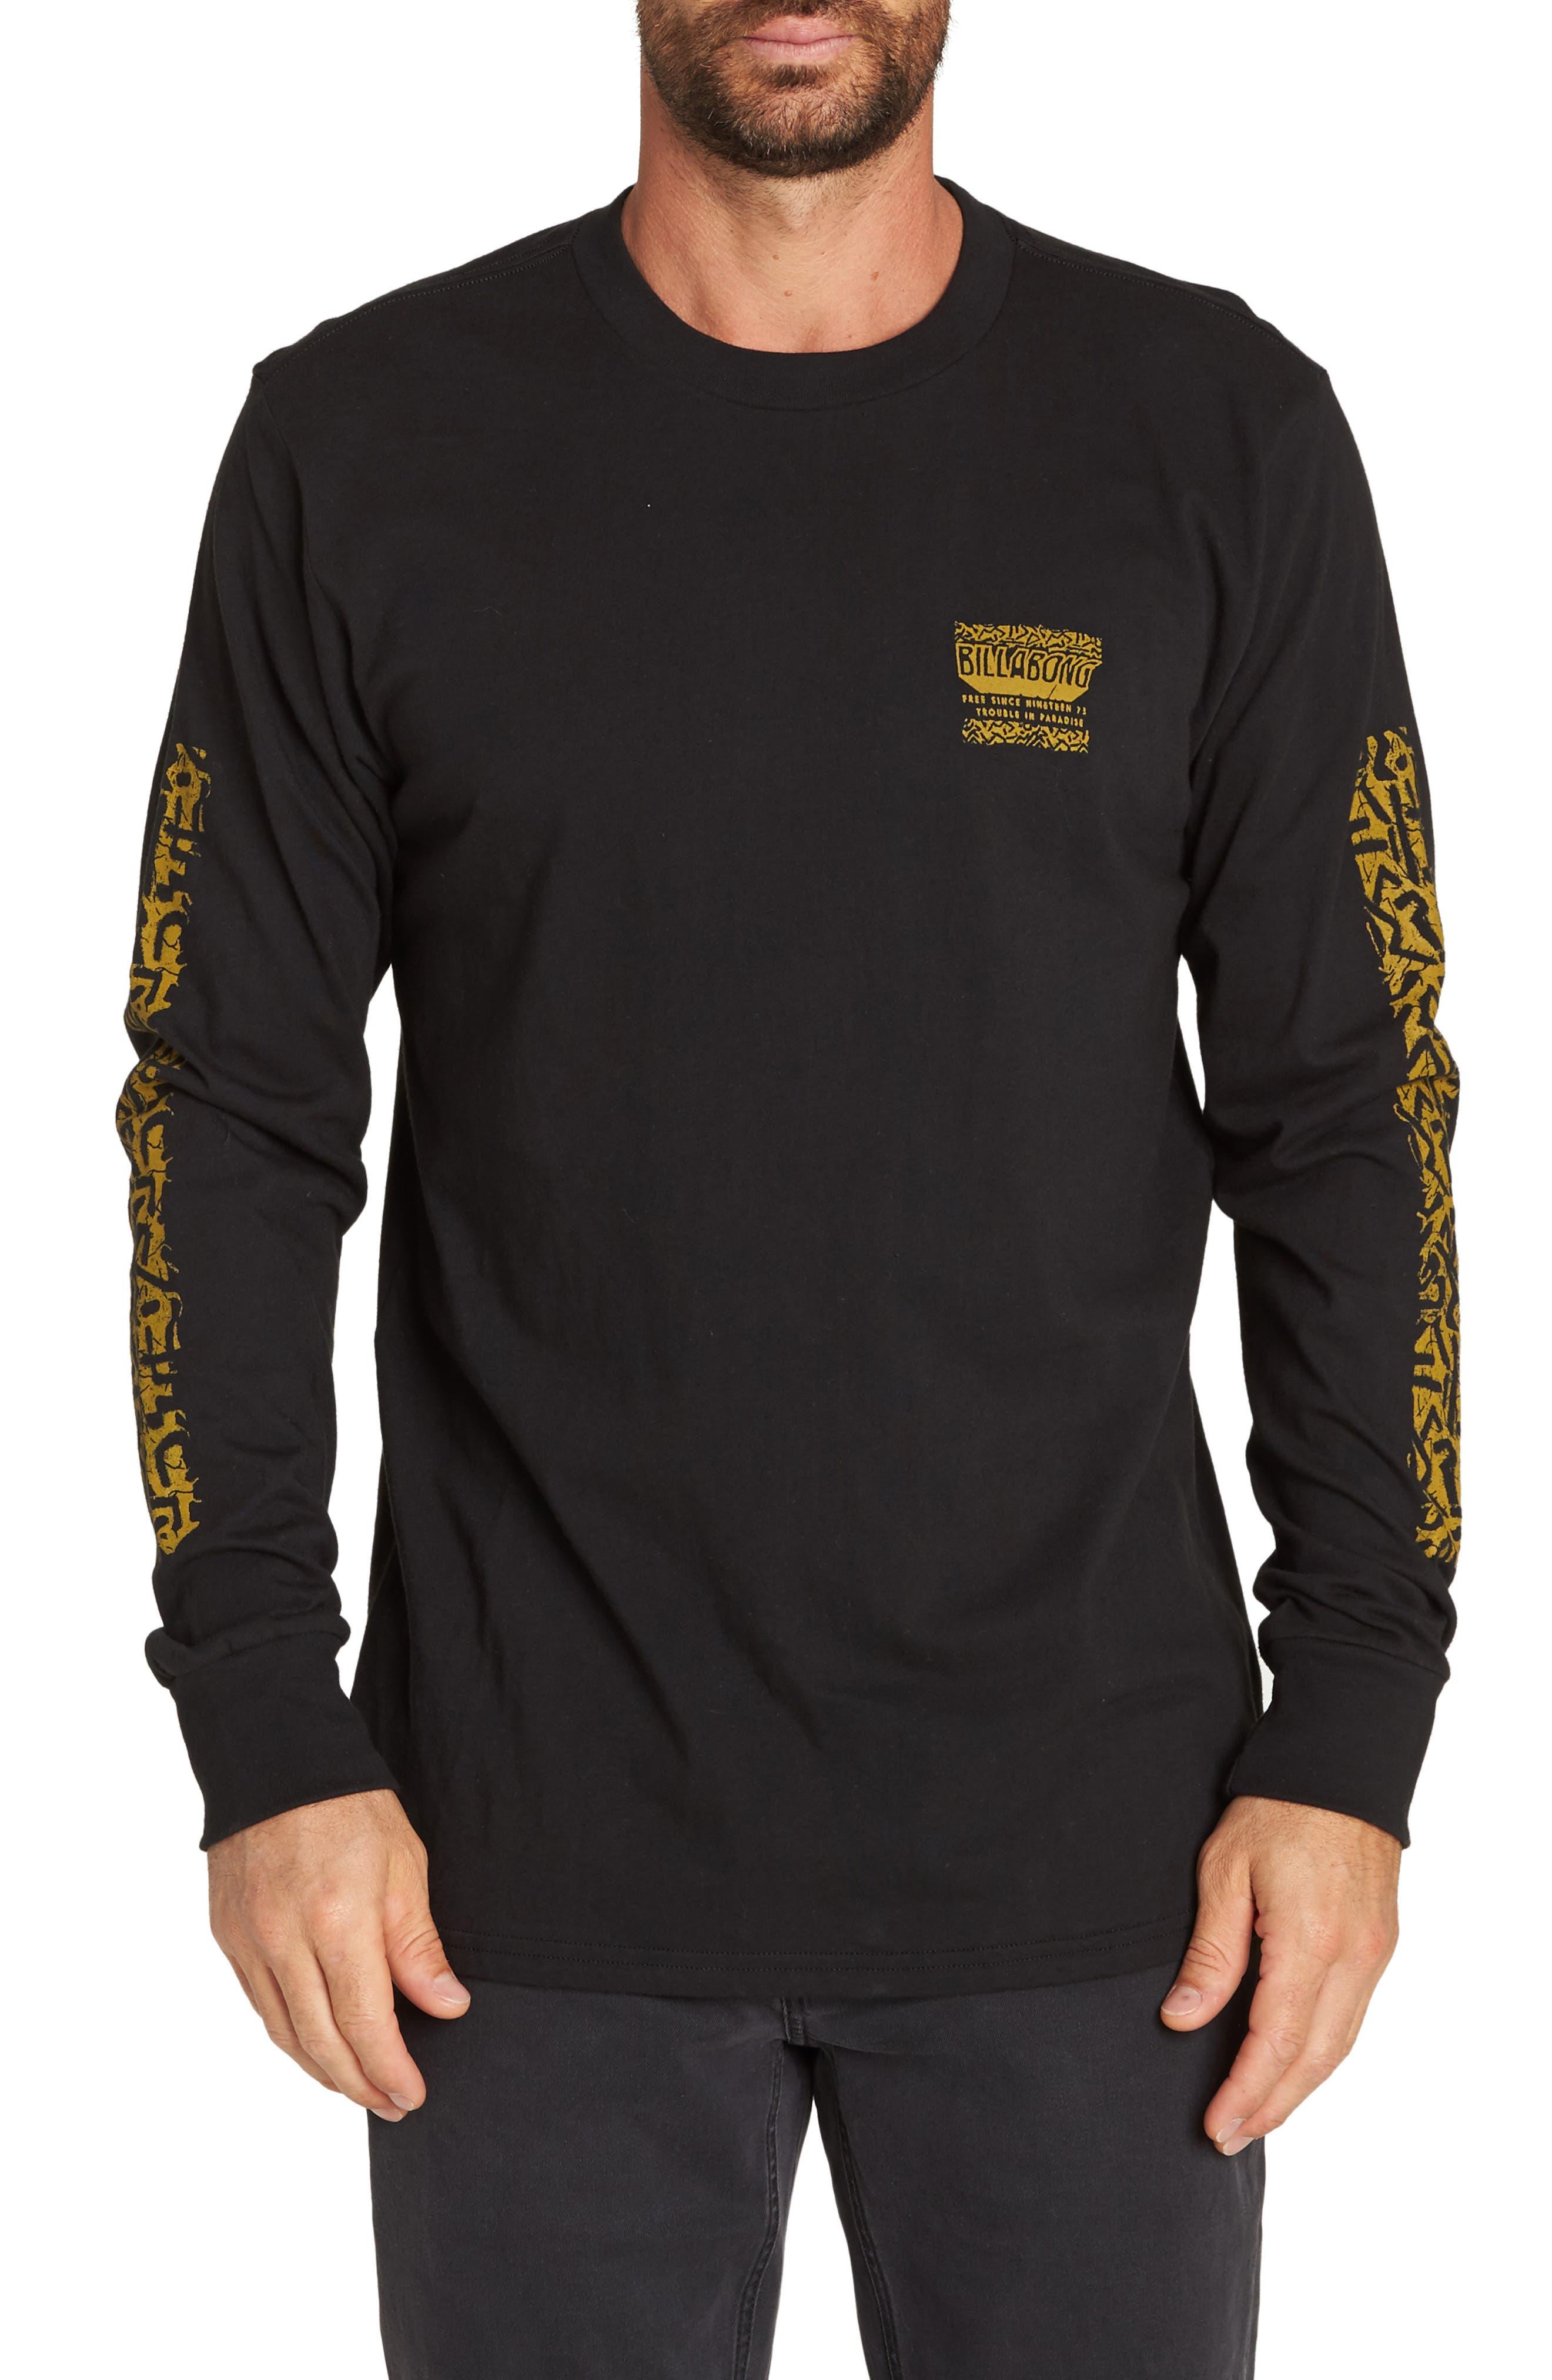 BILLABONG Haze T-Shirt, Main, color, 001